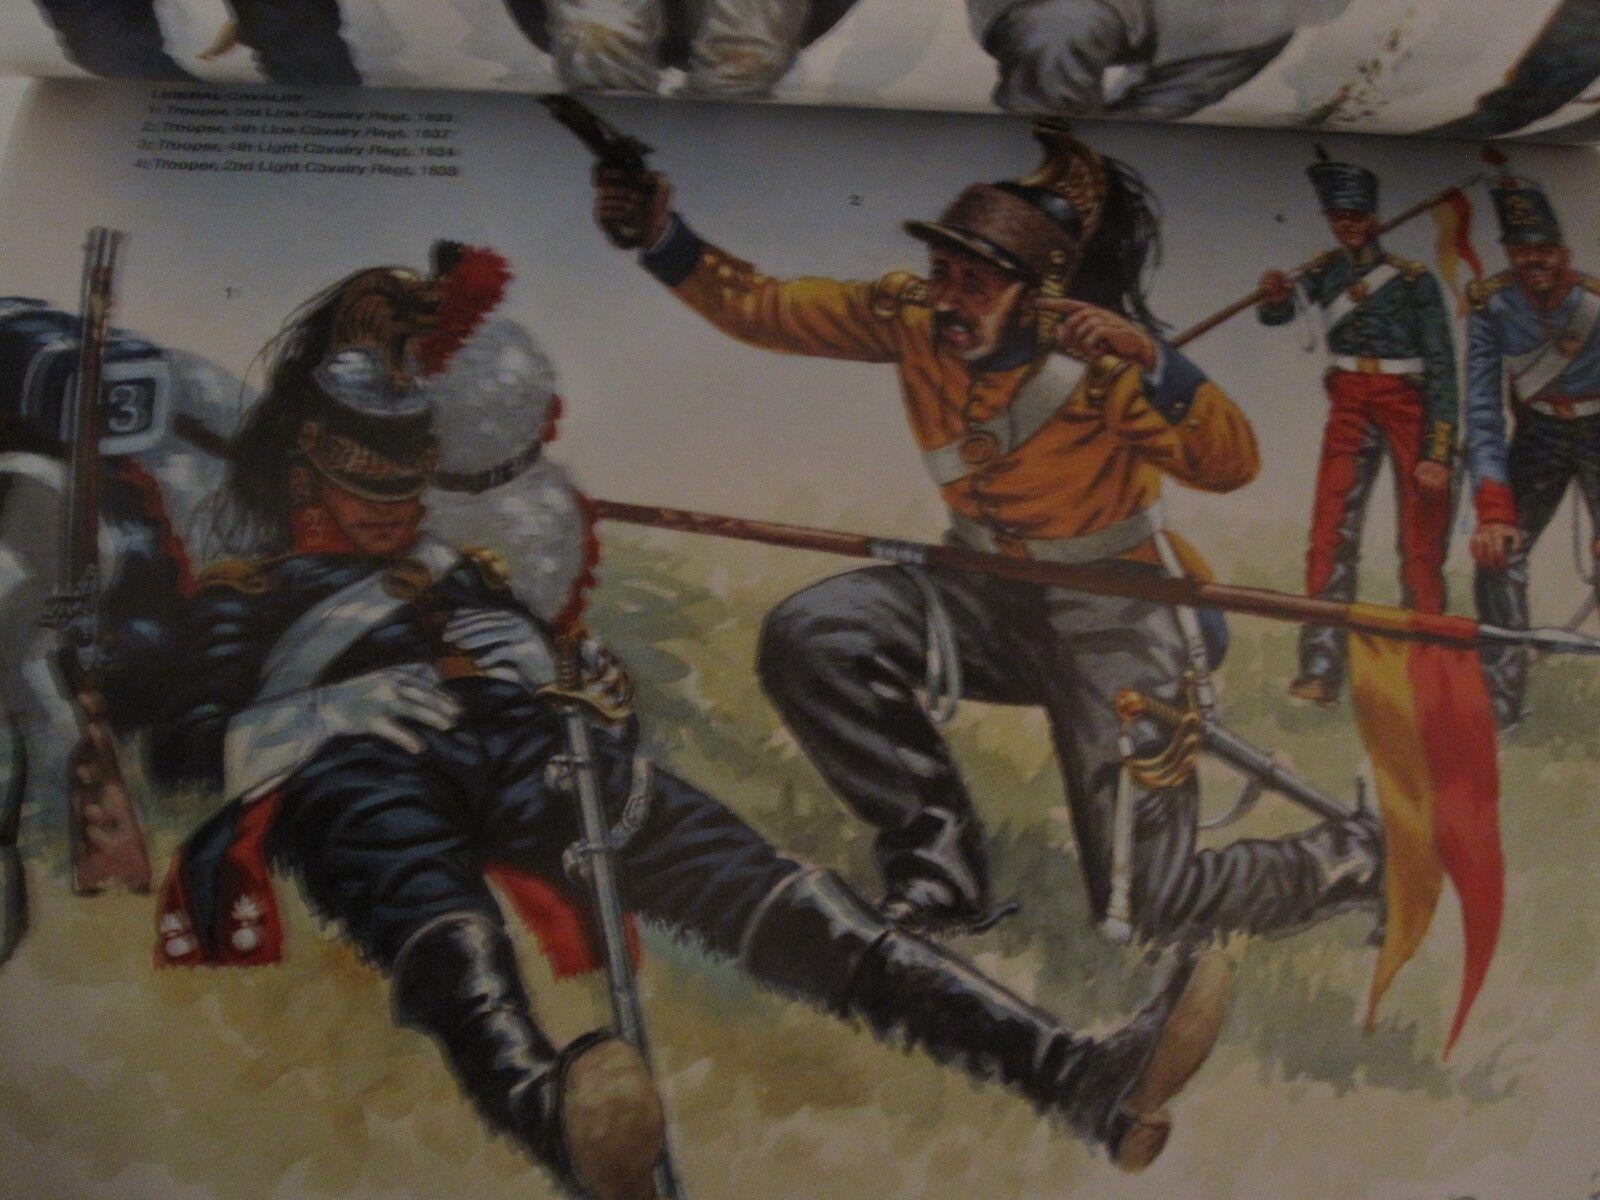 Armies of the First Carlist War 1833